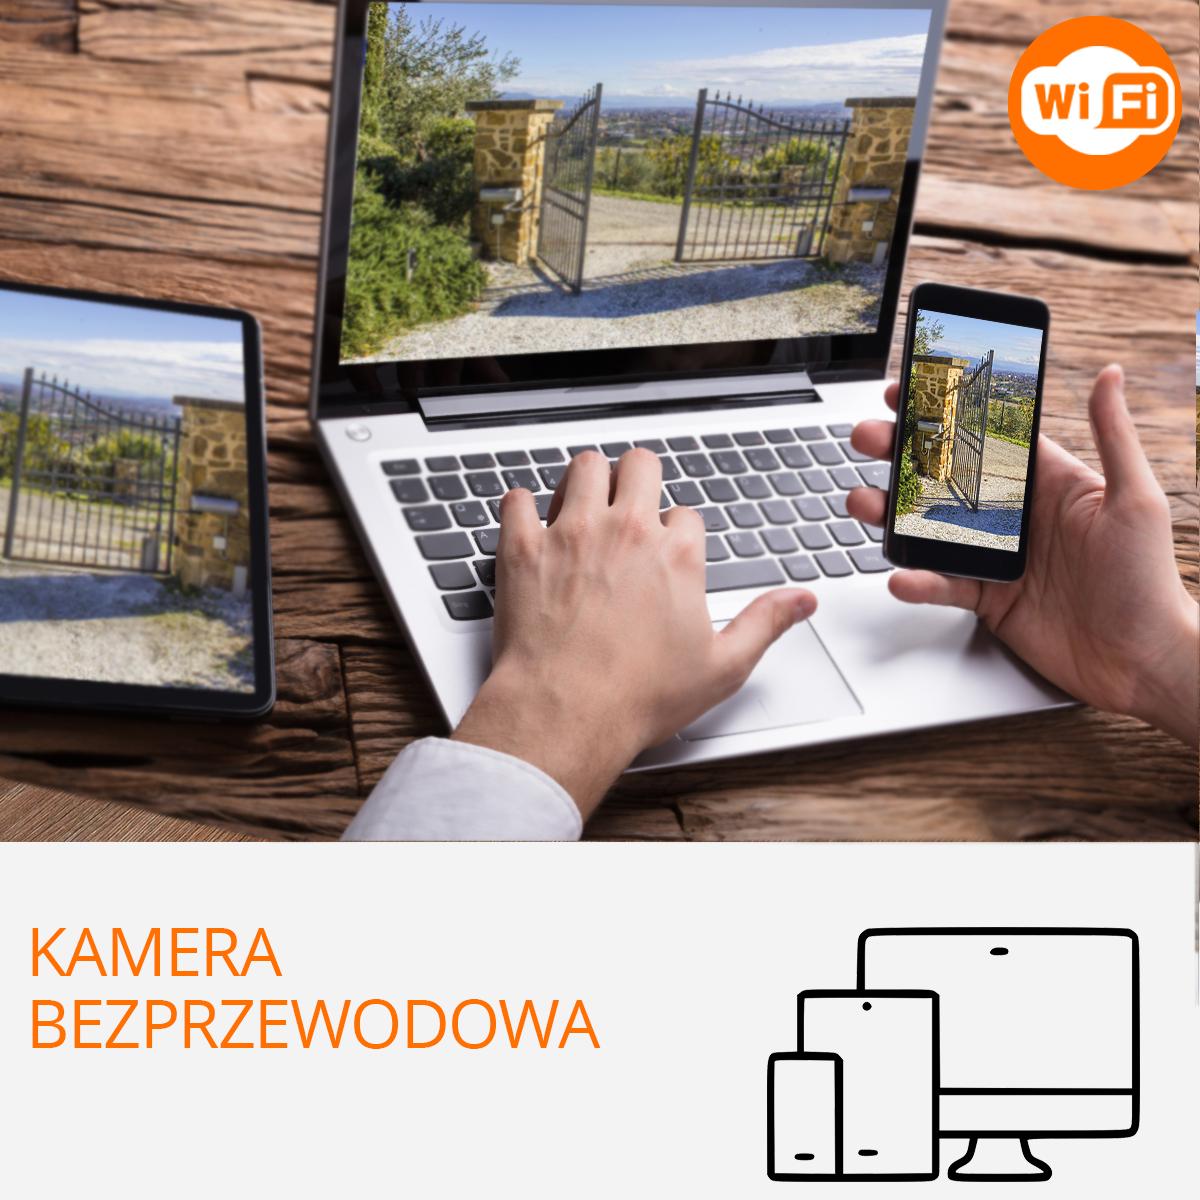 kamera bezprzewodowa mini camset c4 orllo.pl